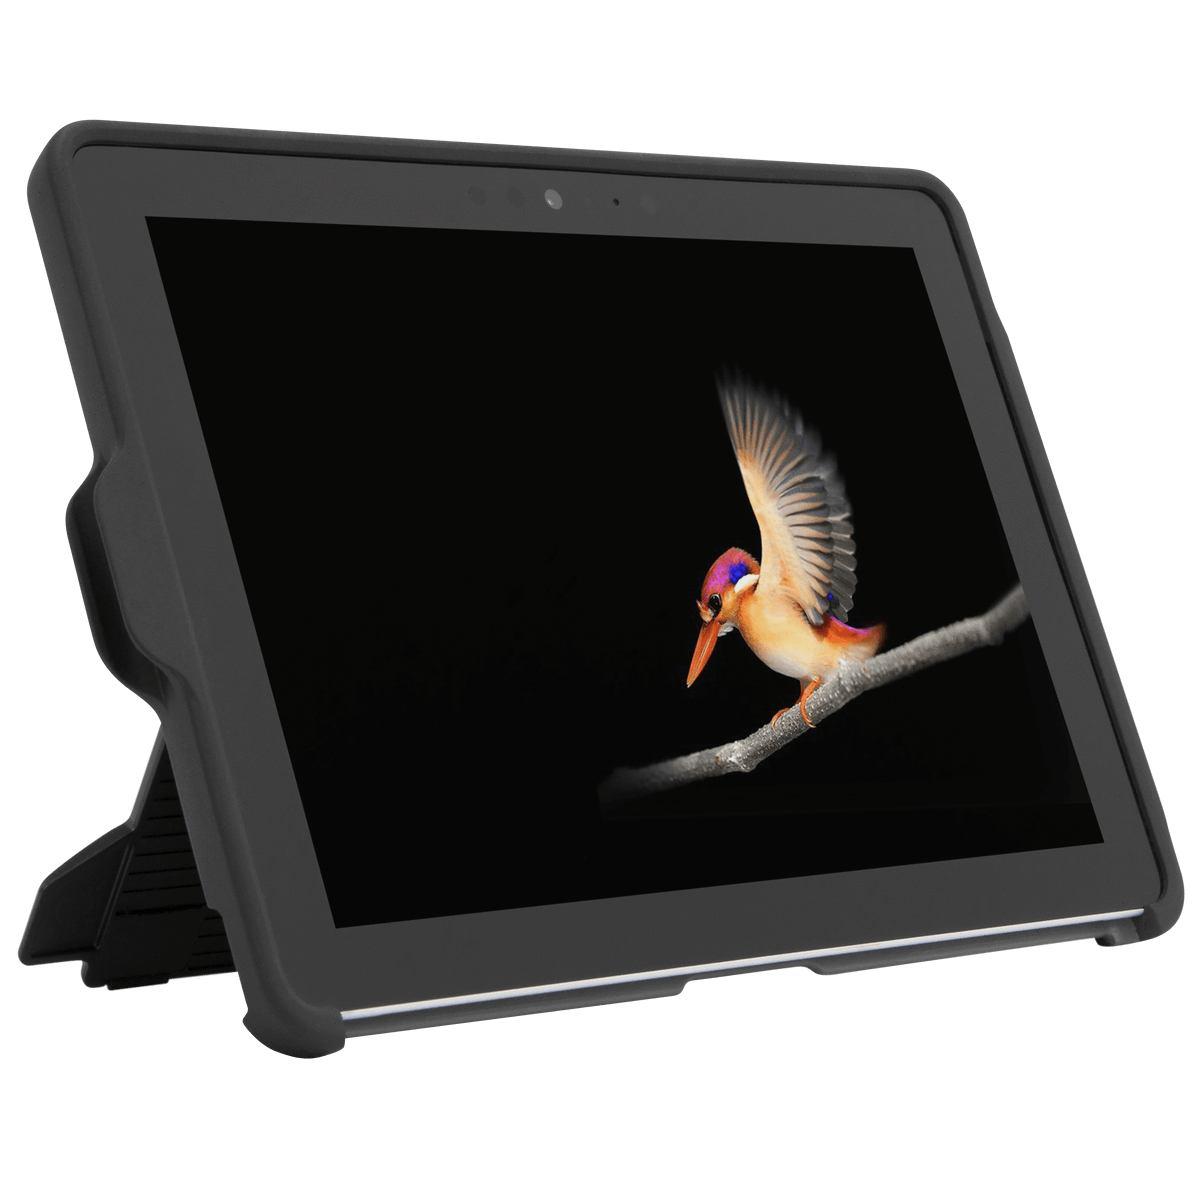 2022274-Targus-THZ779GL-custodia-per-tablet-Custodia-a-libro-Nero-Targus-Schu